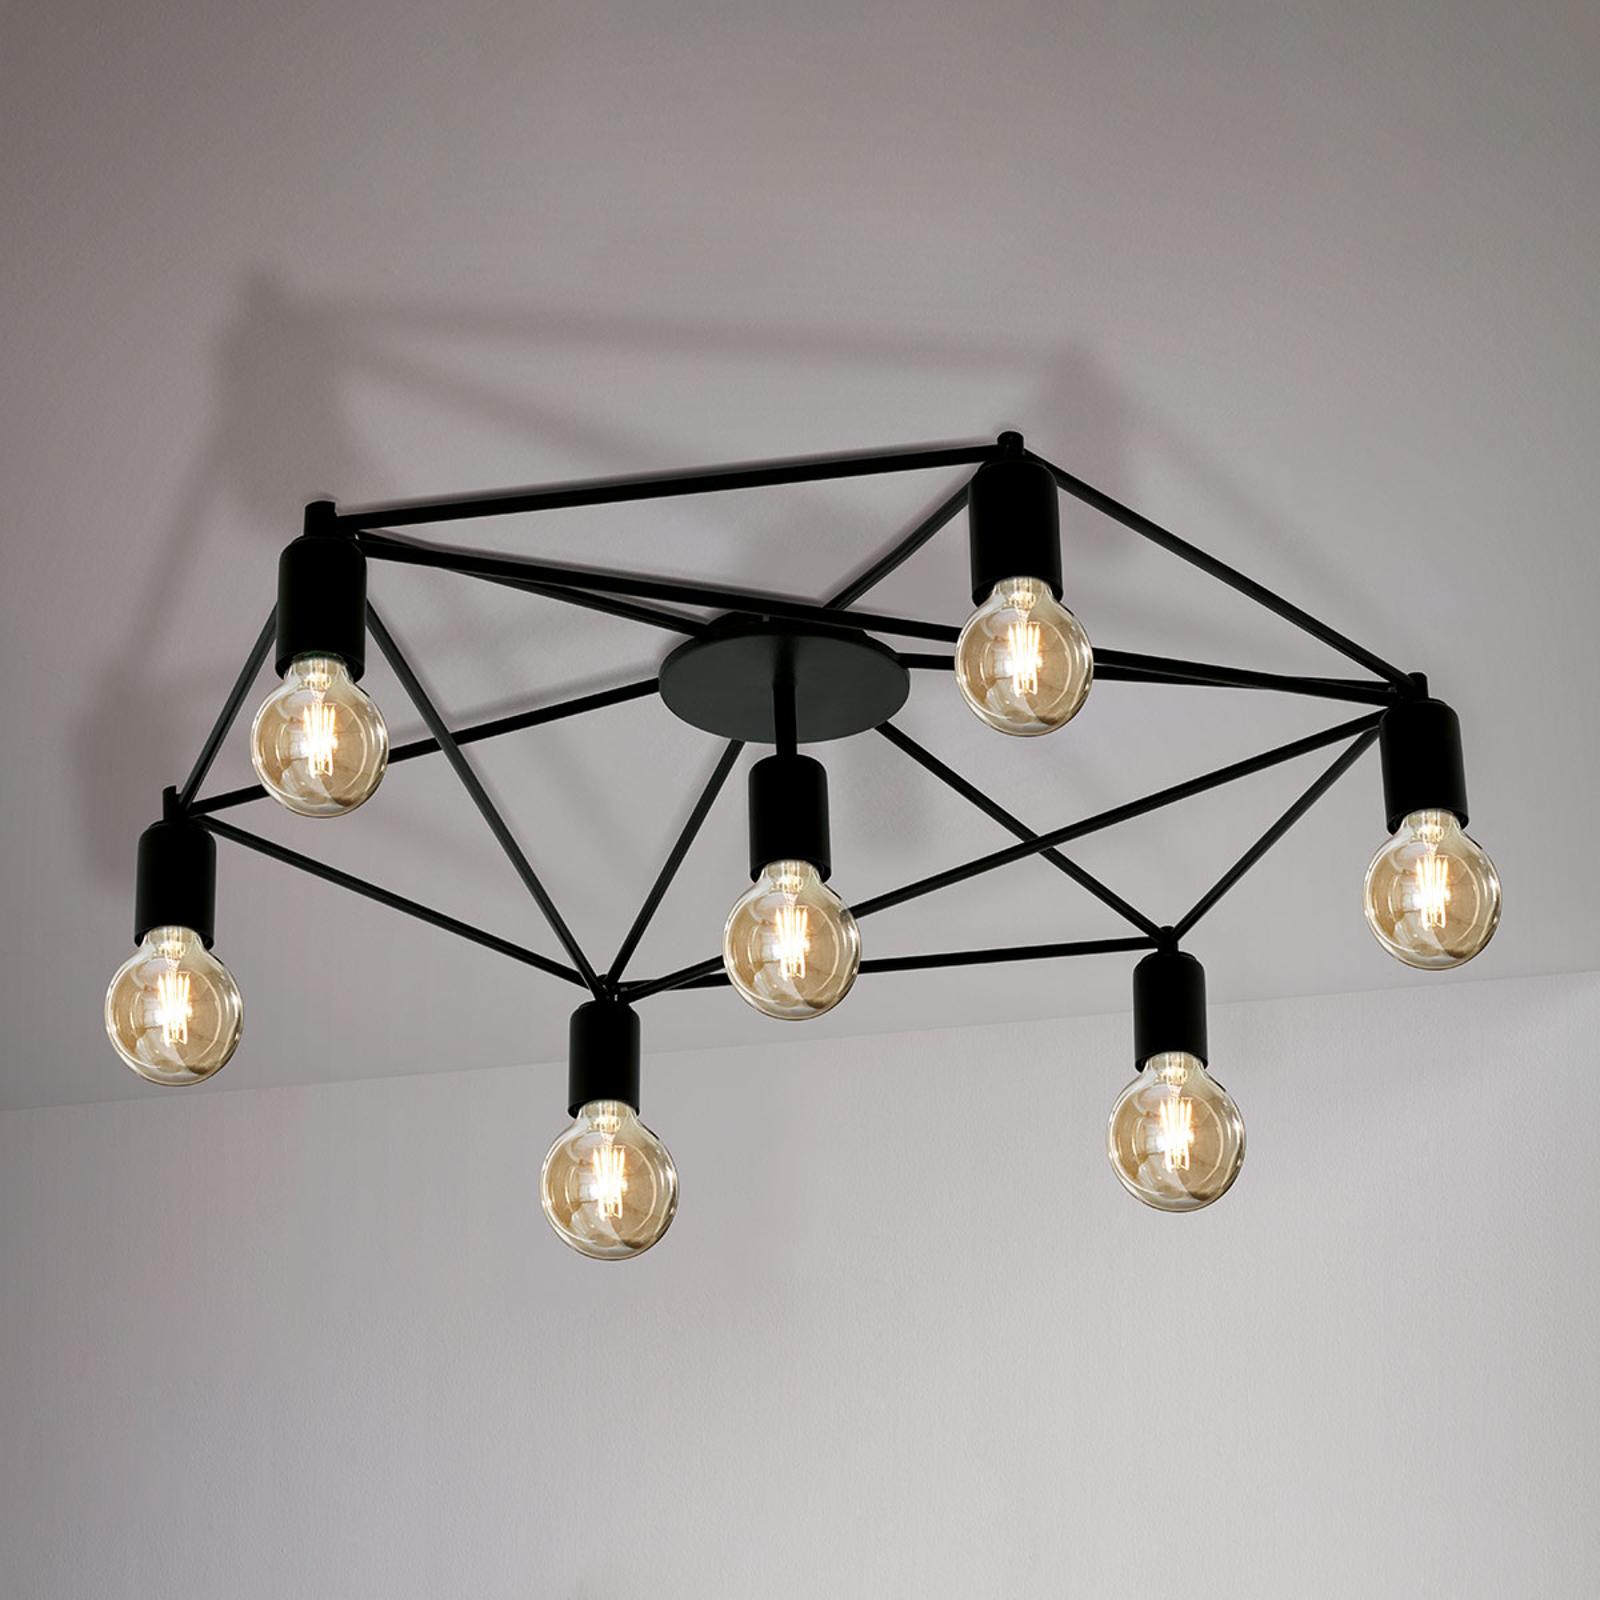 Lampa sufitowa Staiti czarna bez kloszy